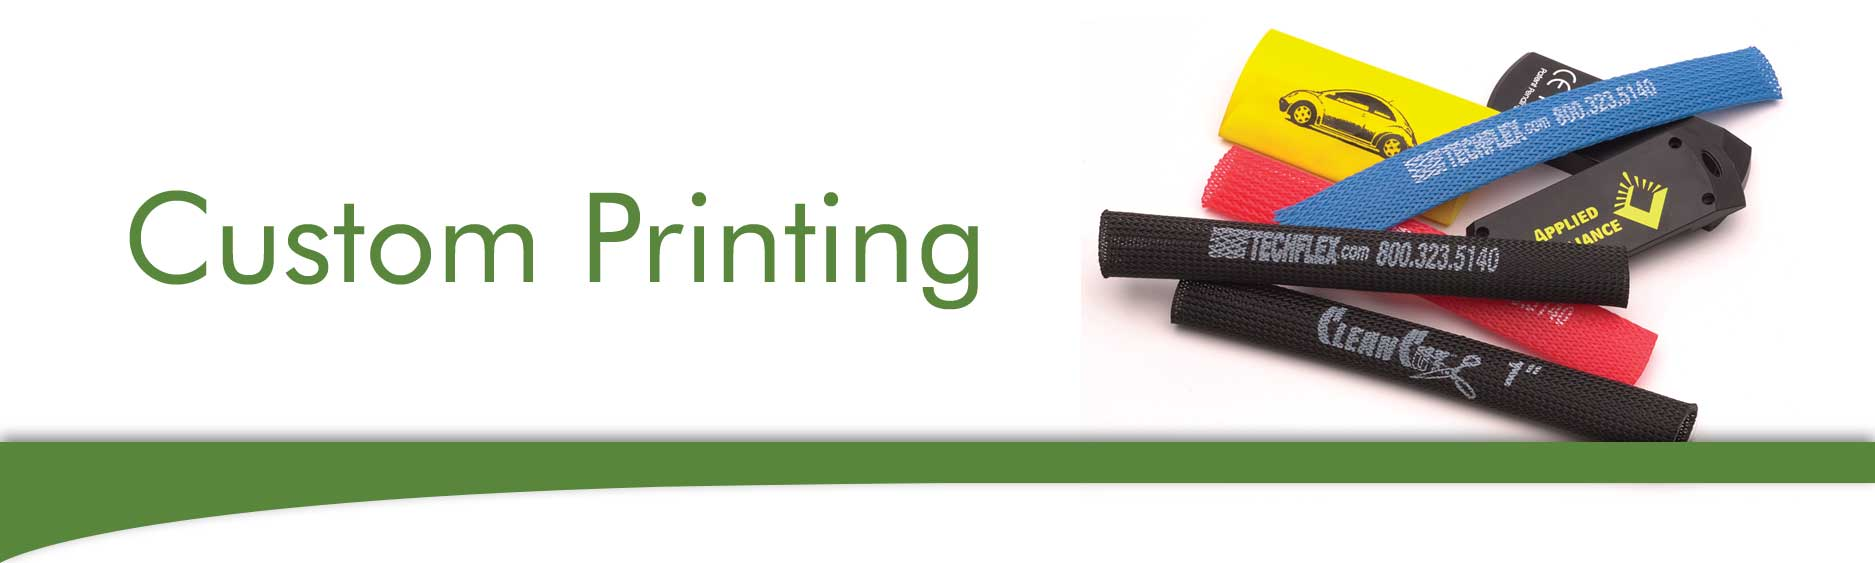 Custom Braided Printing